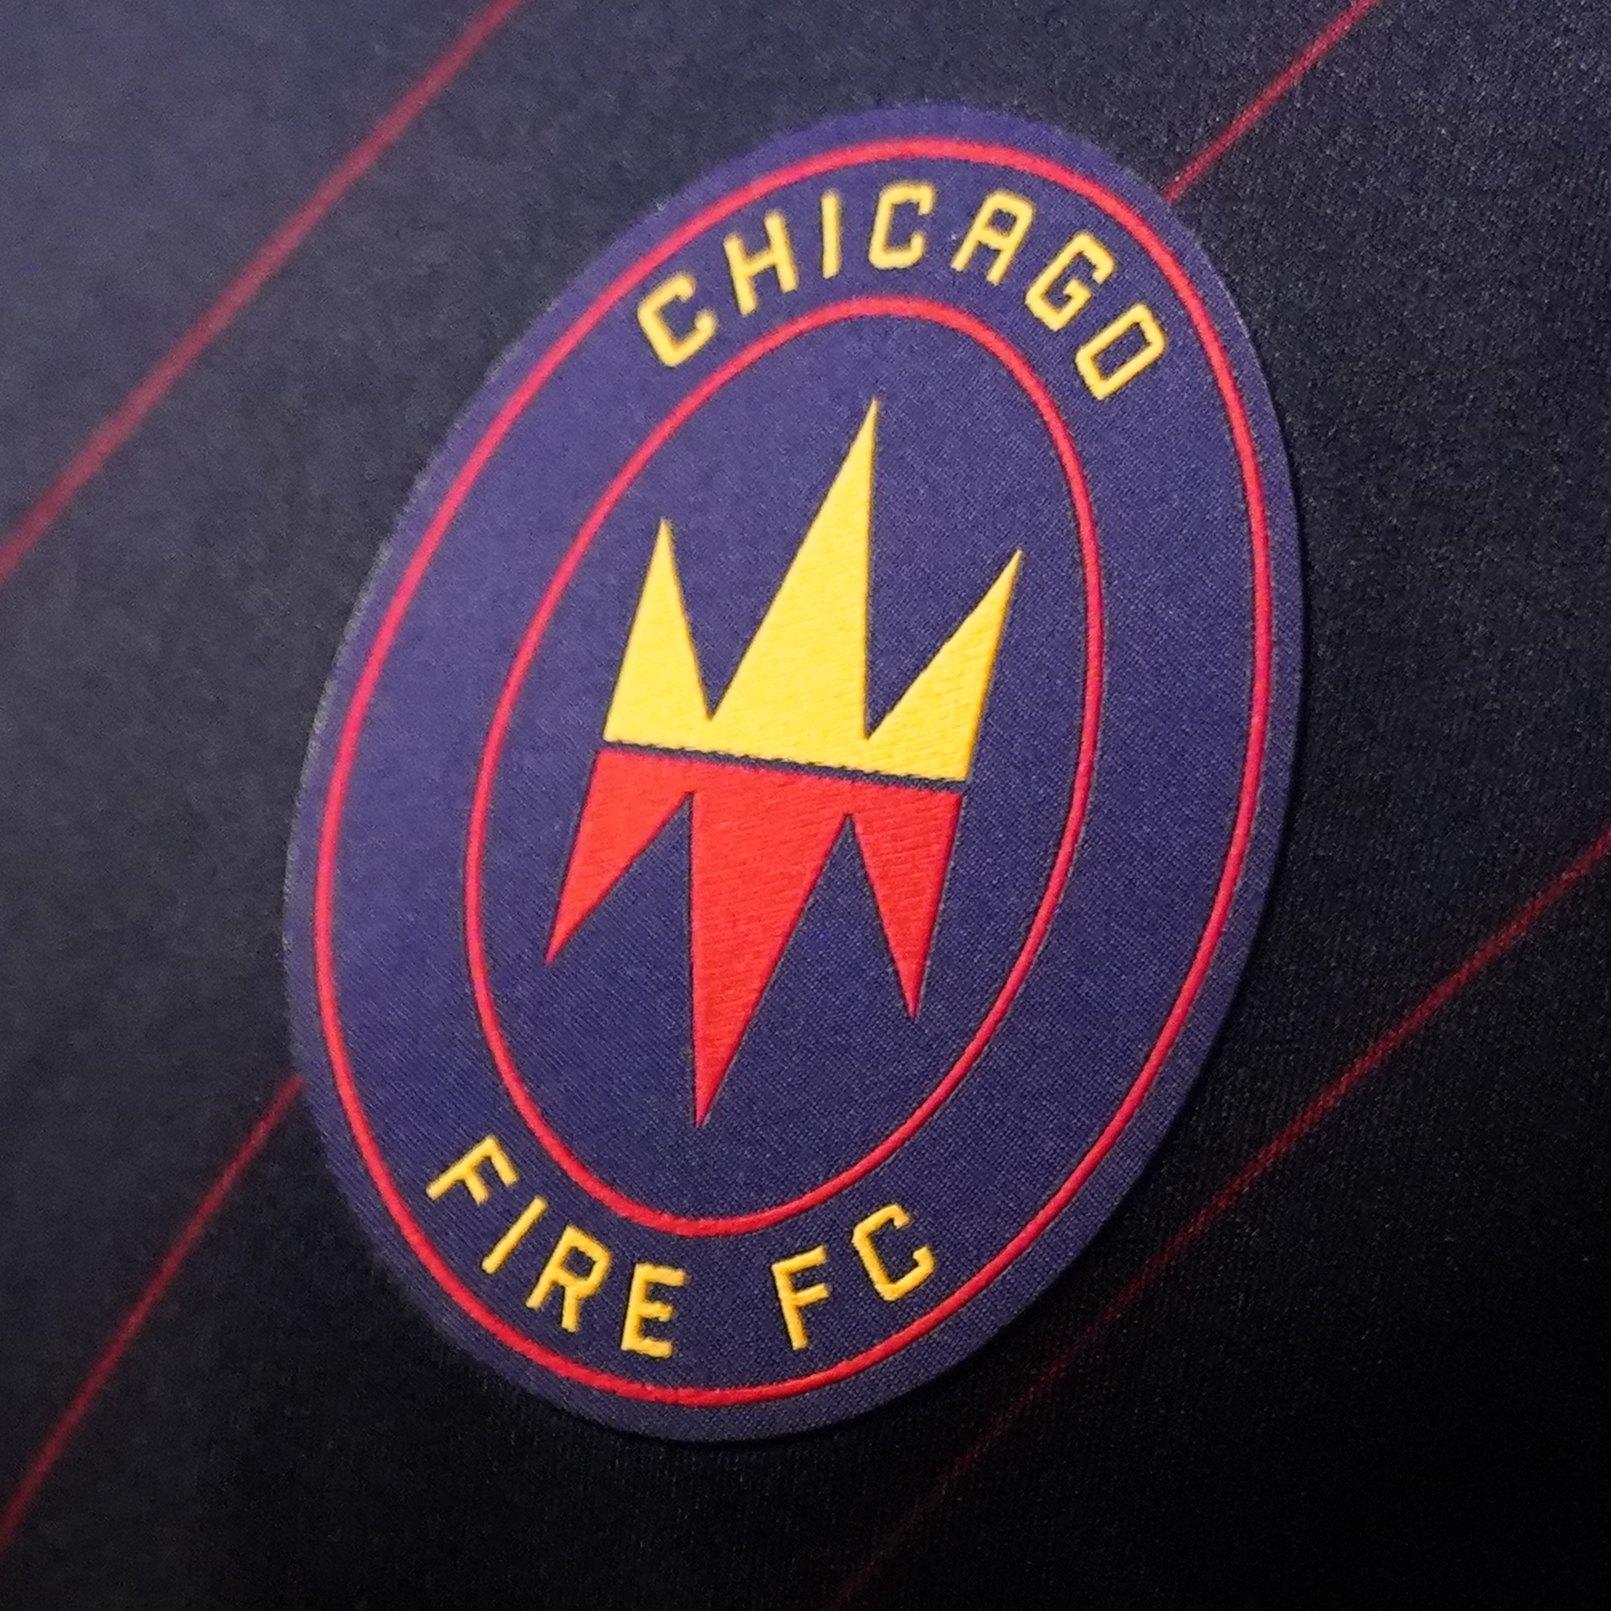 Camiseta Adidas del Chicago Fire 2020/21 | Imagen Web Oficial